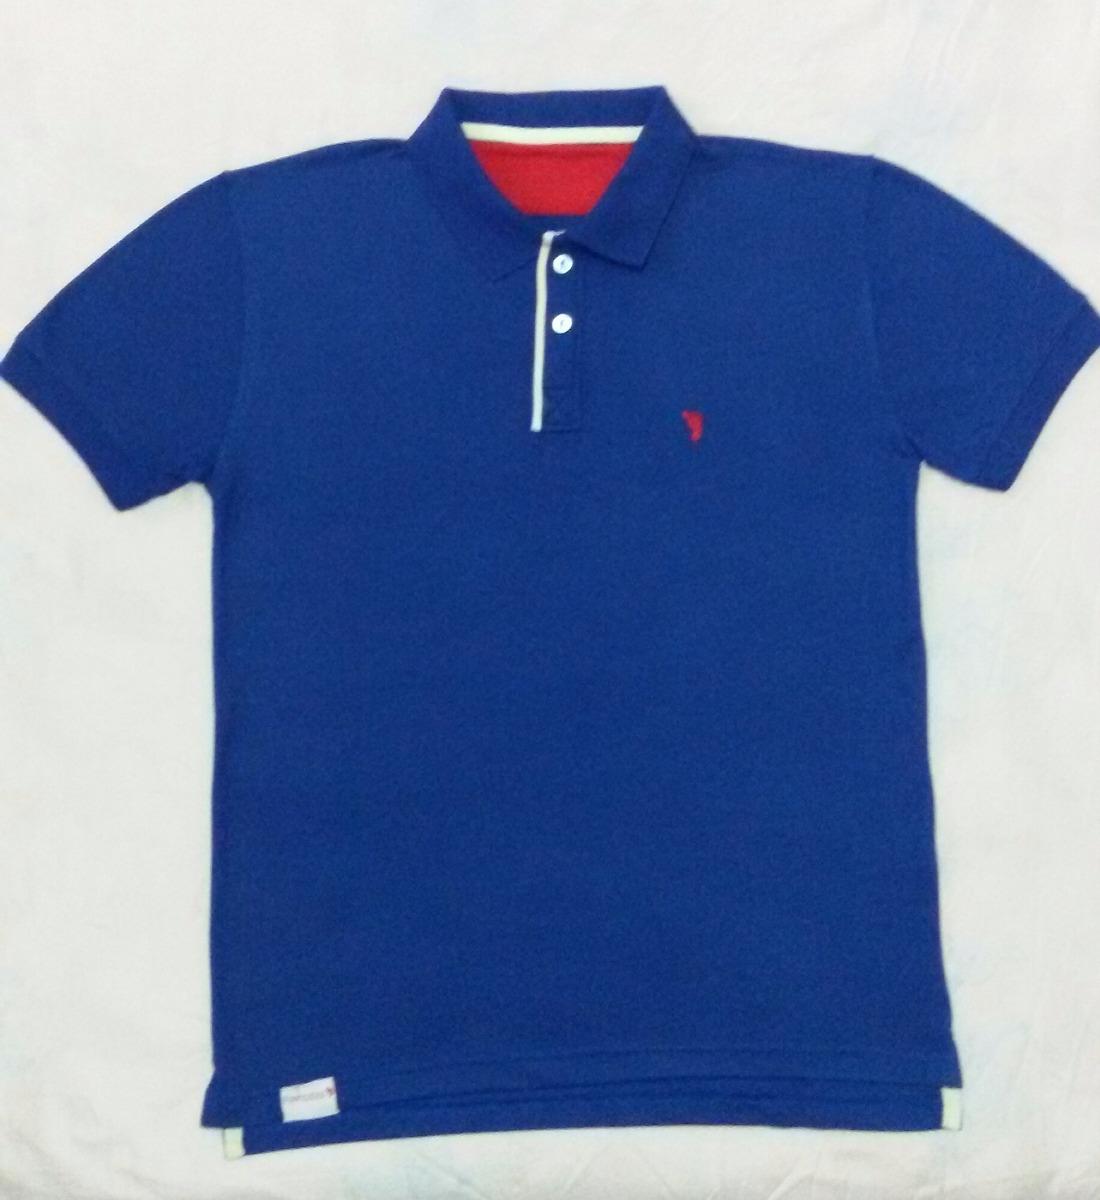 721d854fe863e kit de 1 camiseta pólo e 1 boné preto ou branco footsoles. Carregando zoom.